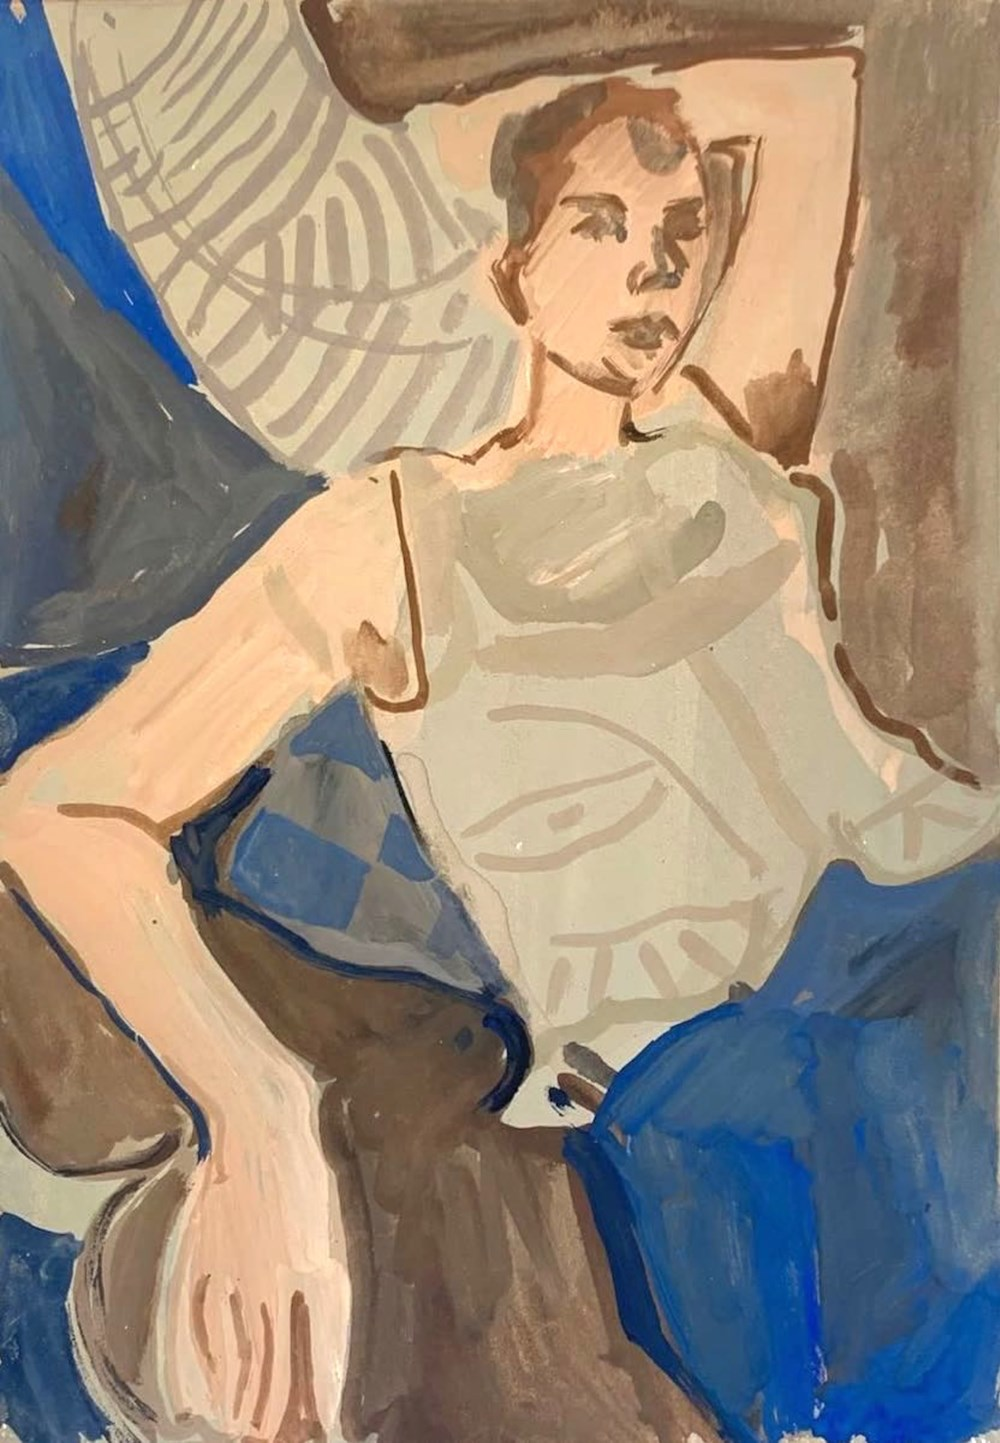 Life on Venus II | The Human, Live Auction - Lot 2, Ella Squirrell, Reclining